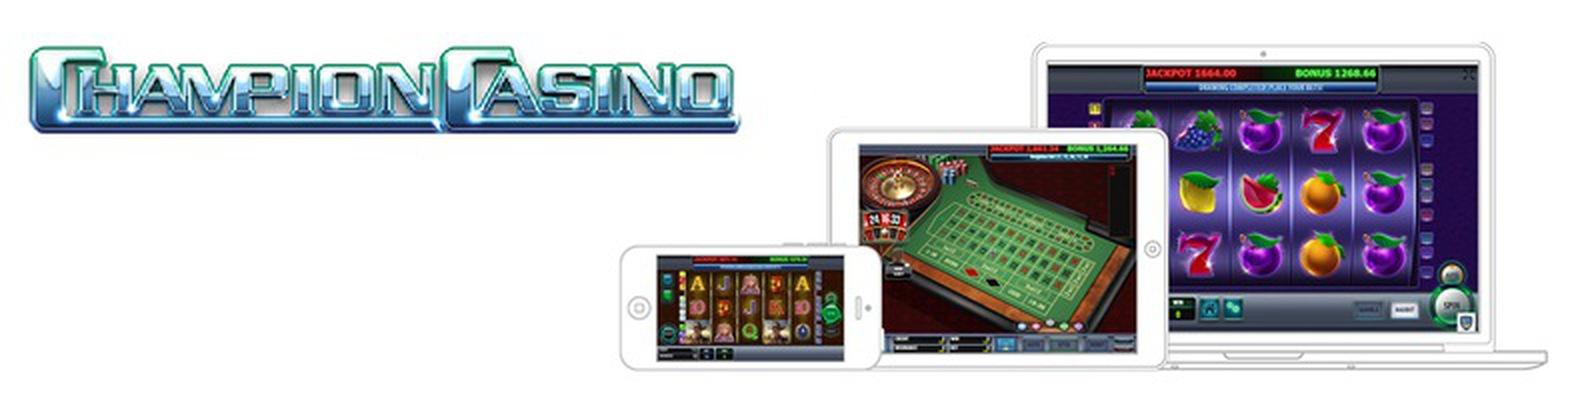 https championclub casino ru play html